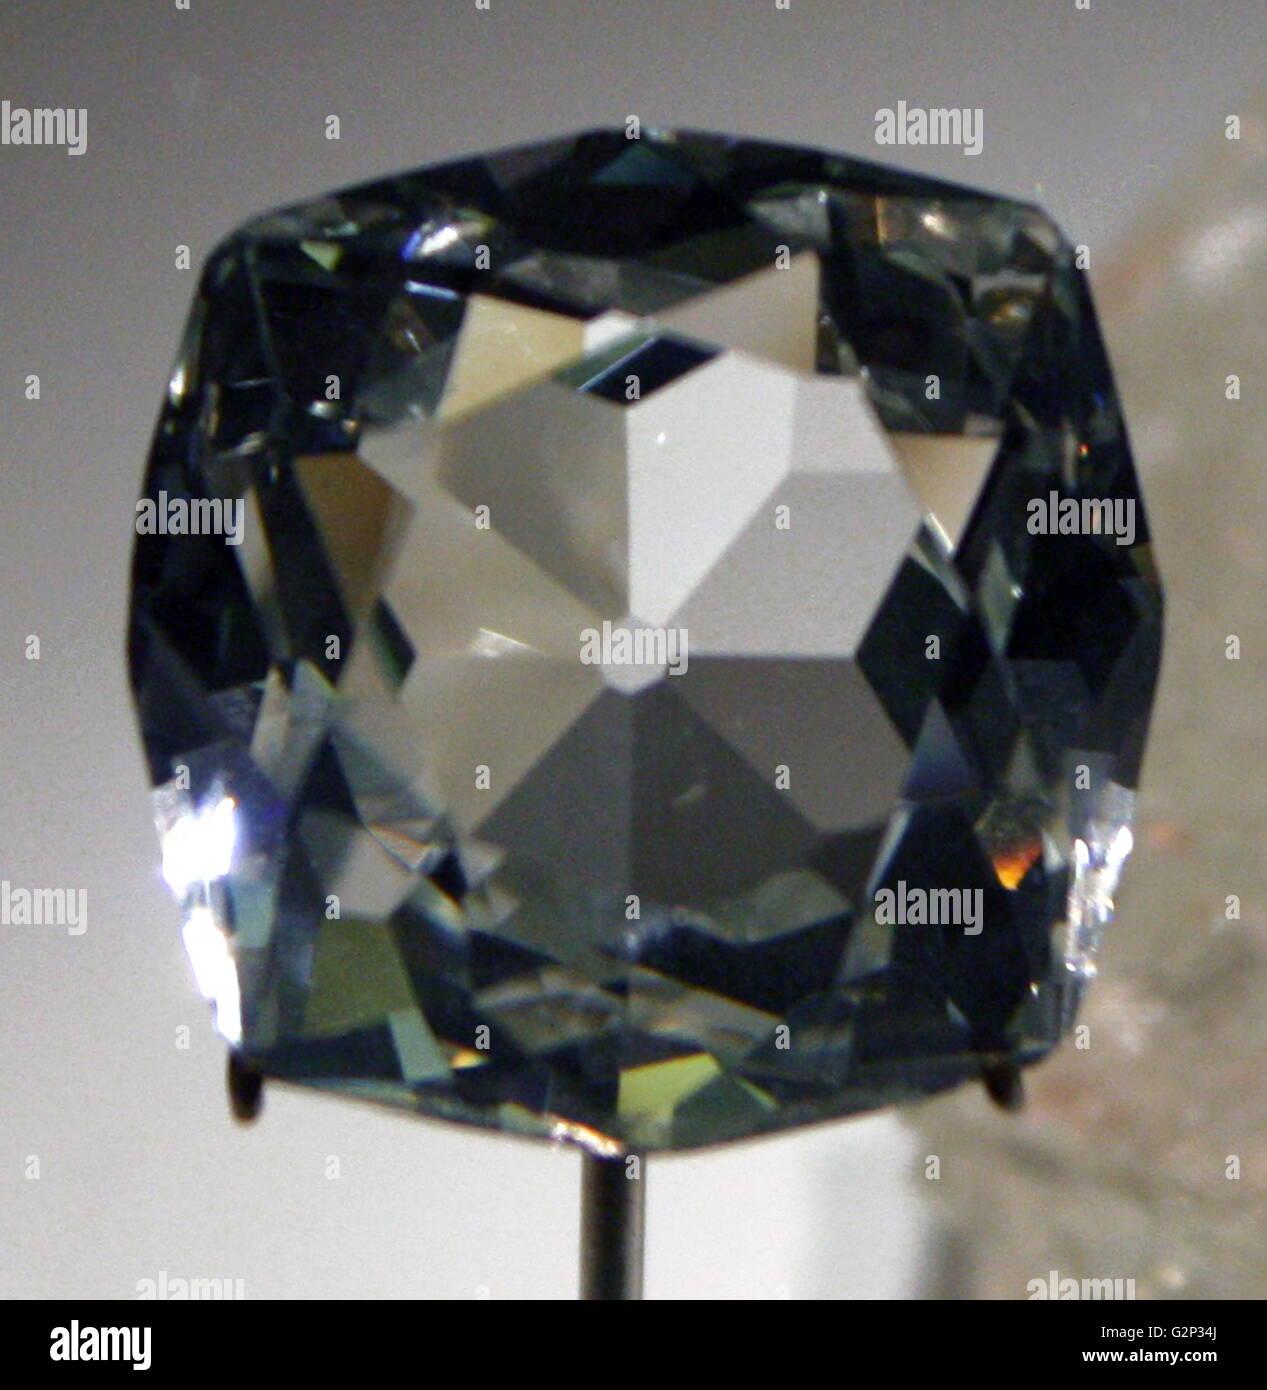 The Scotch Koh-i-Noor, an 88 carat Goshenite Beryl - Stock Image